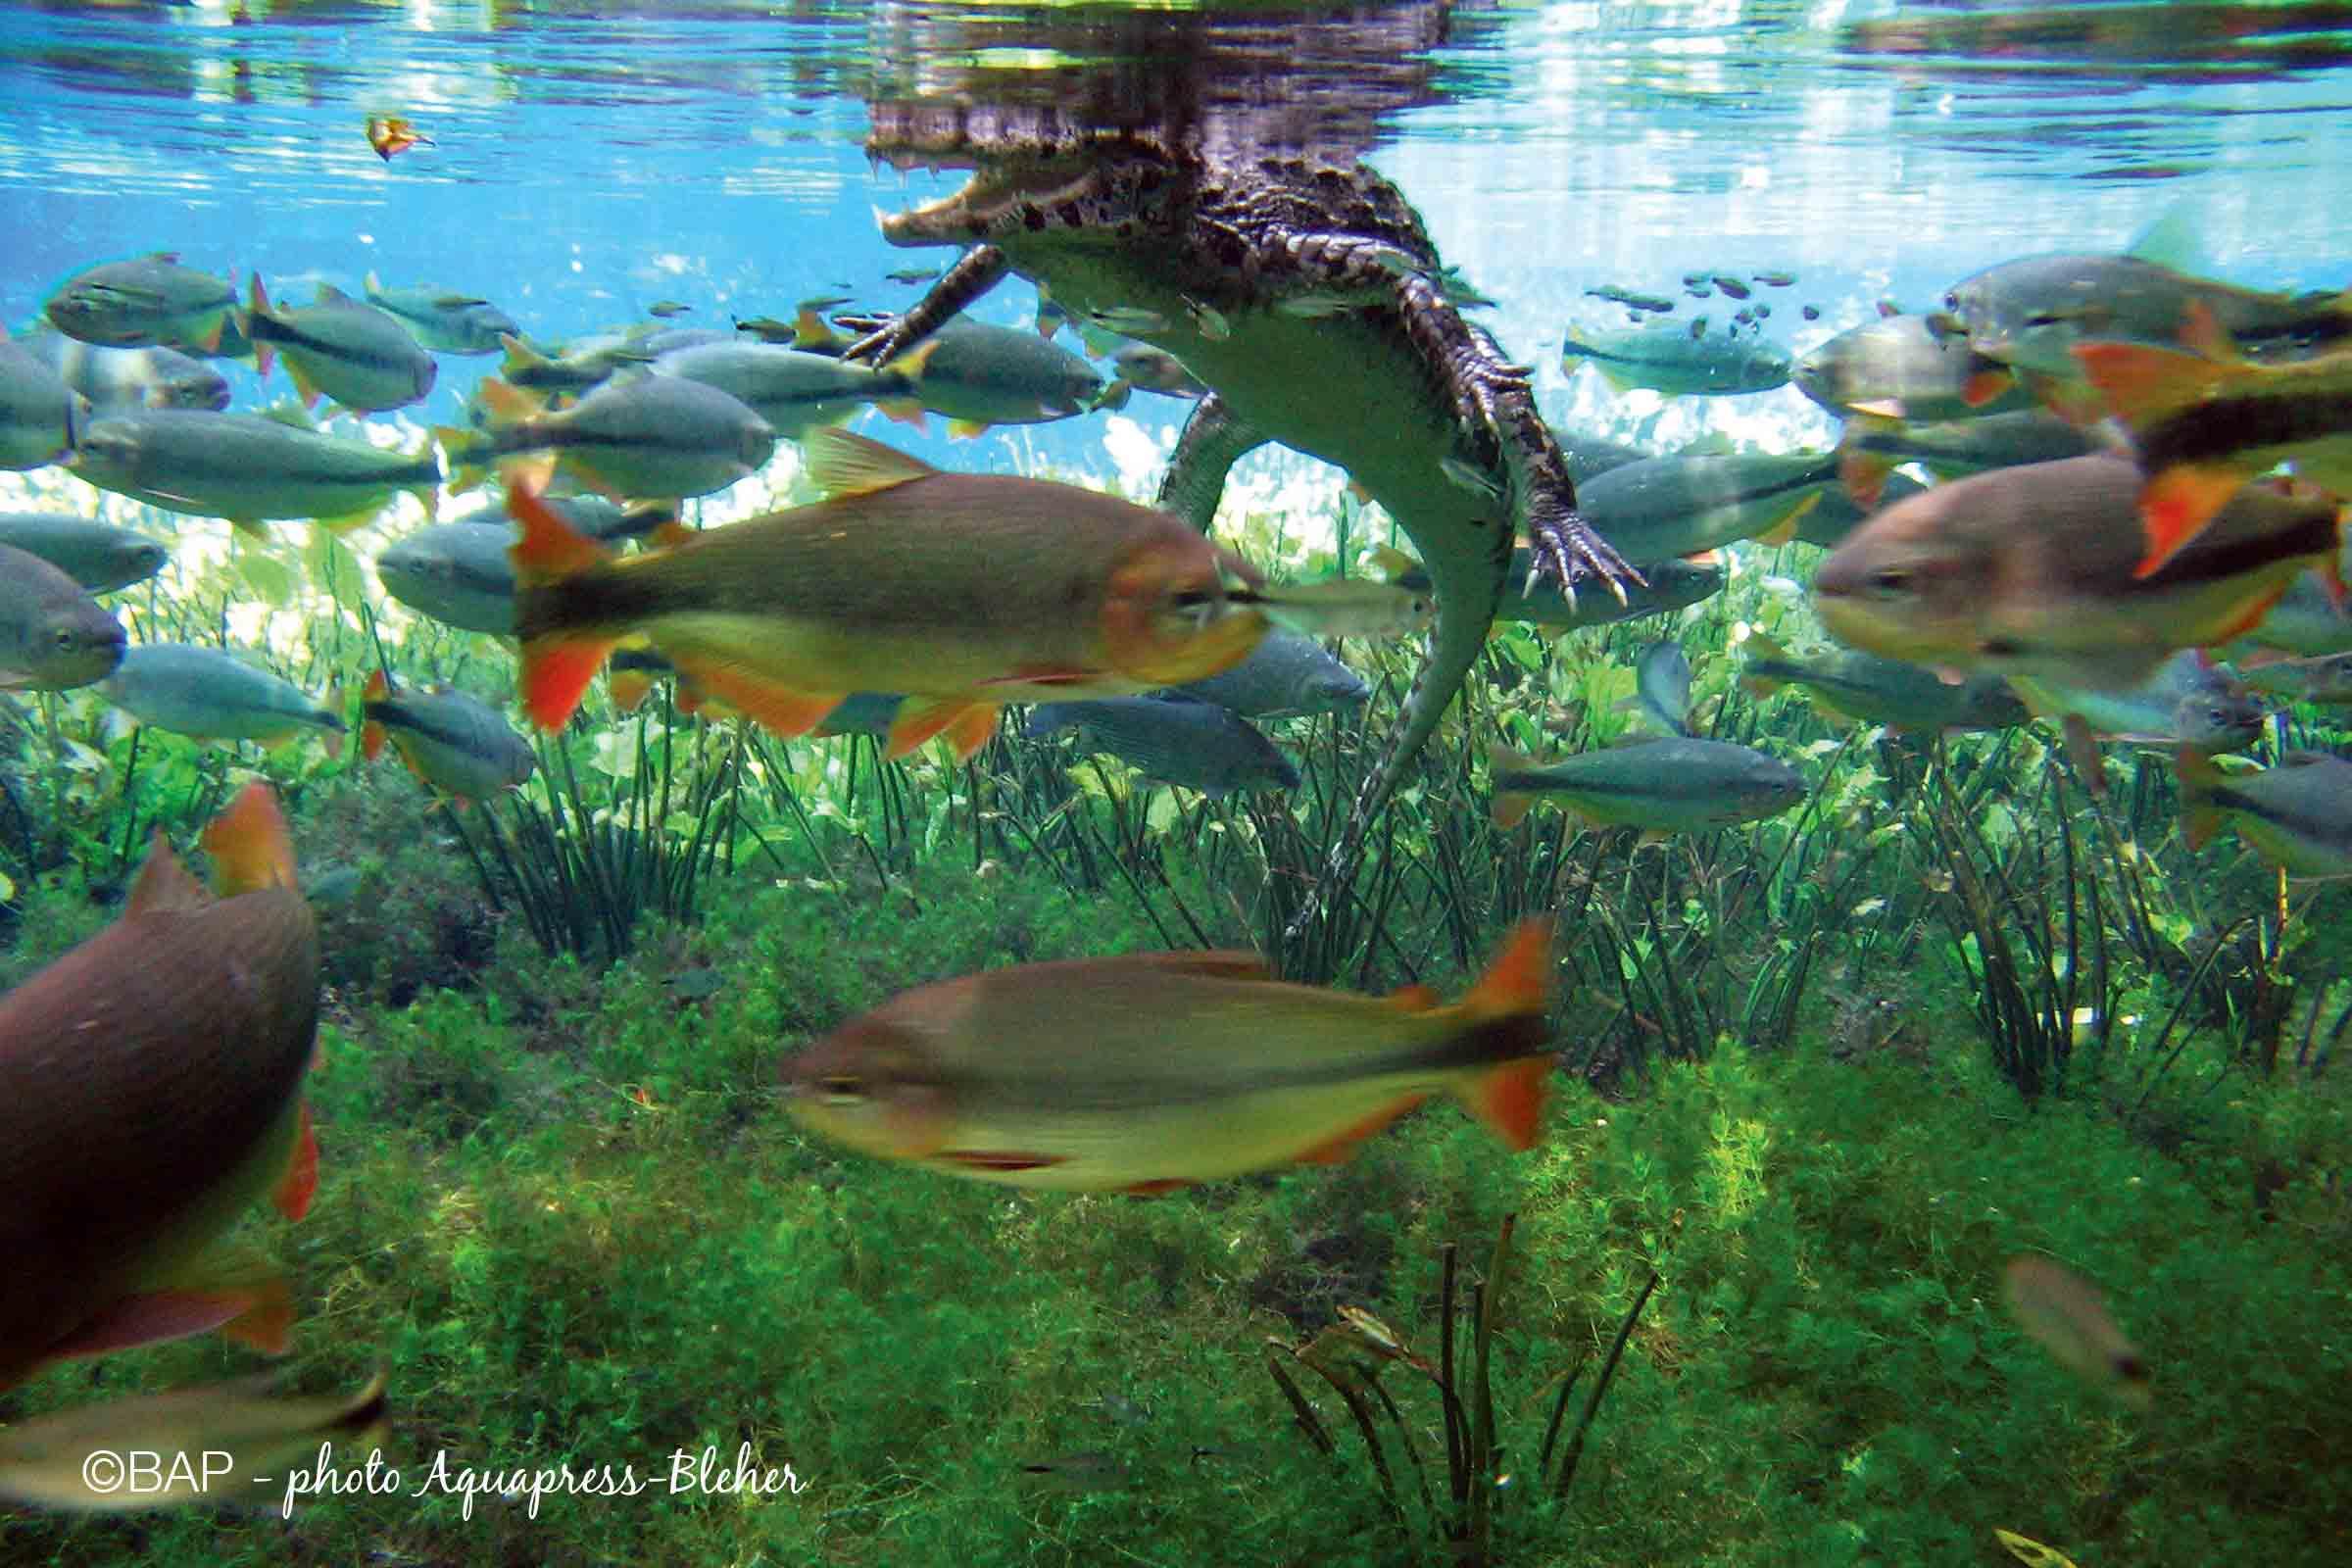 Brycon hilarii, Rio Formoso, Pantanal, Brazil. ©BAP, photo Aquapress-Bleher